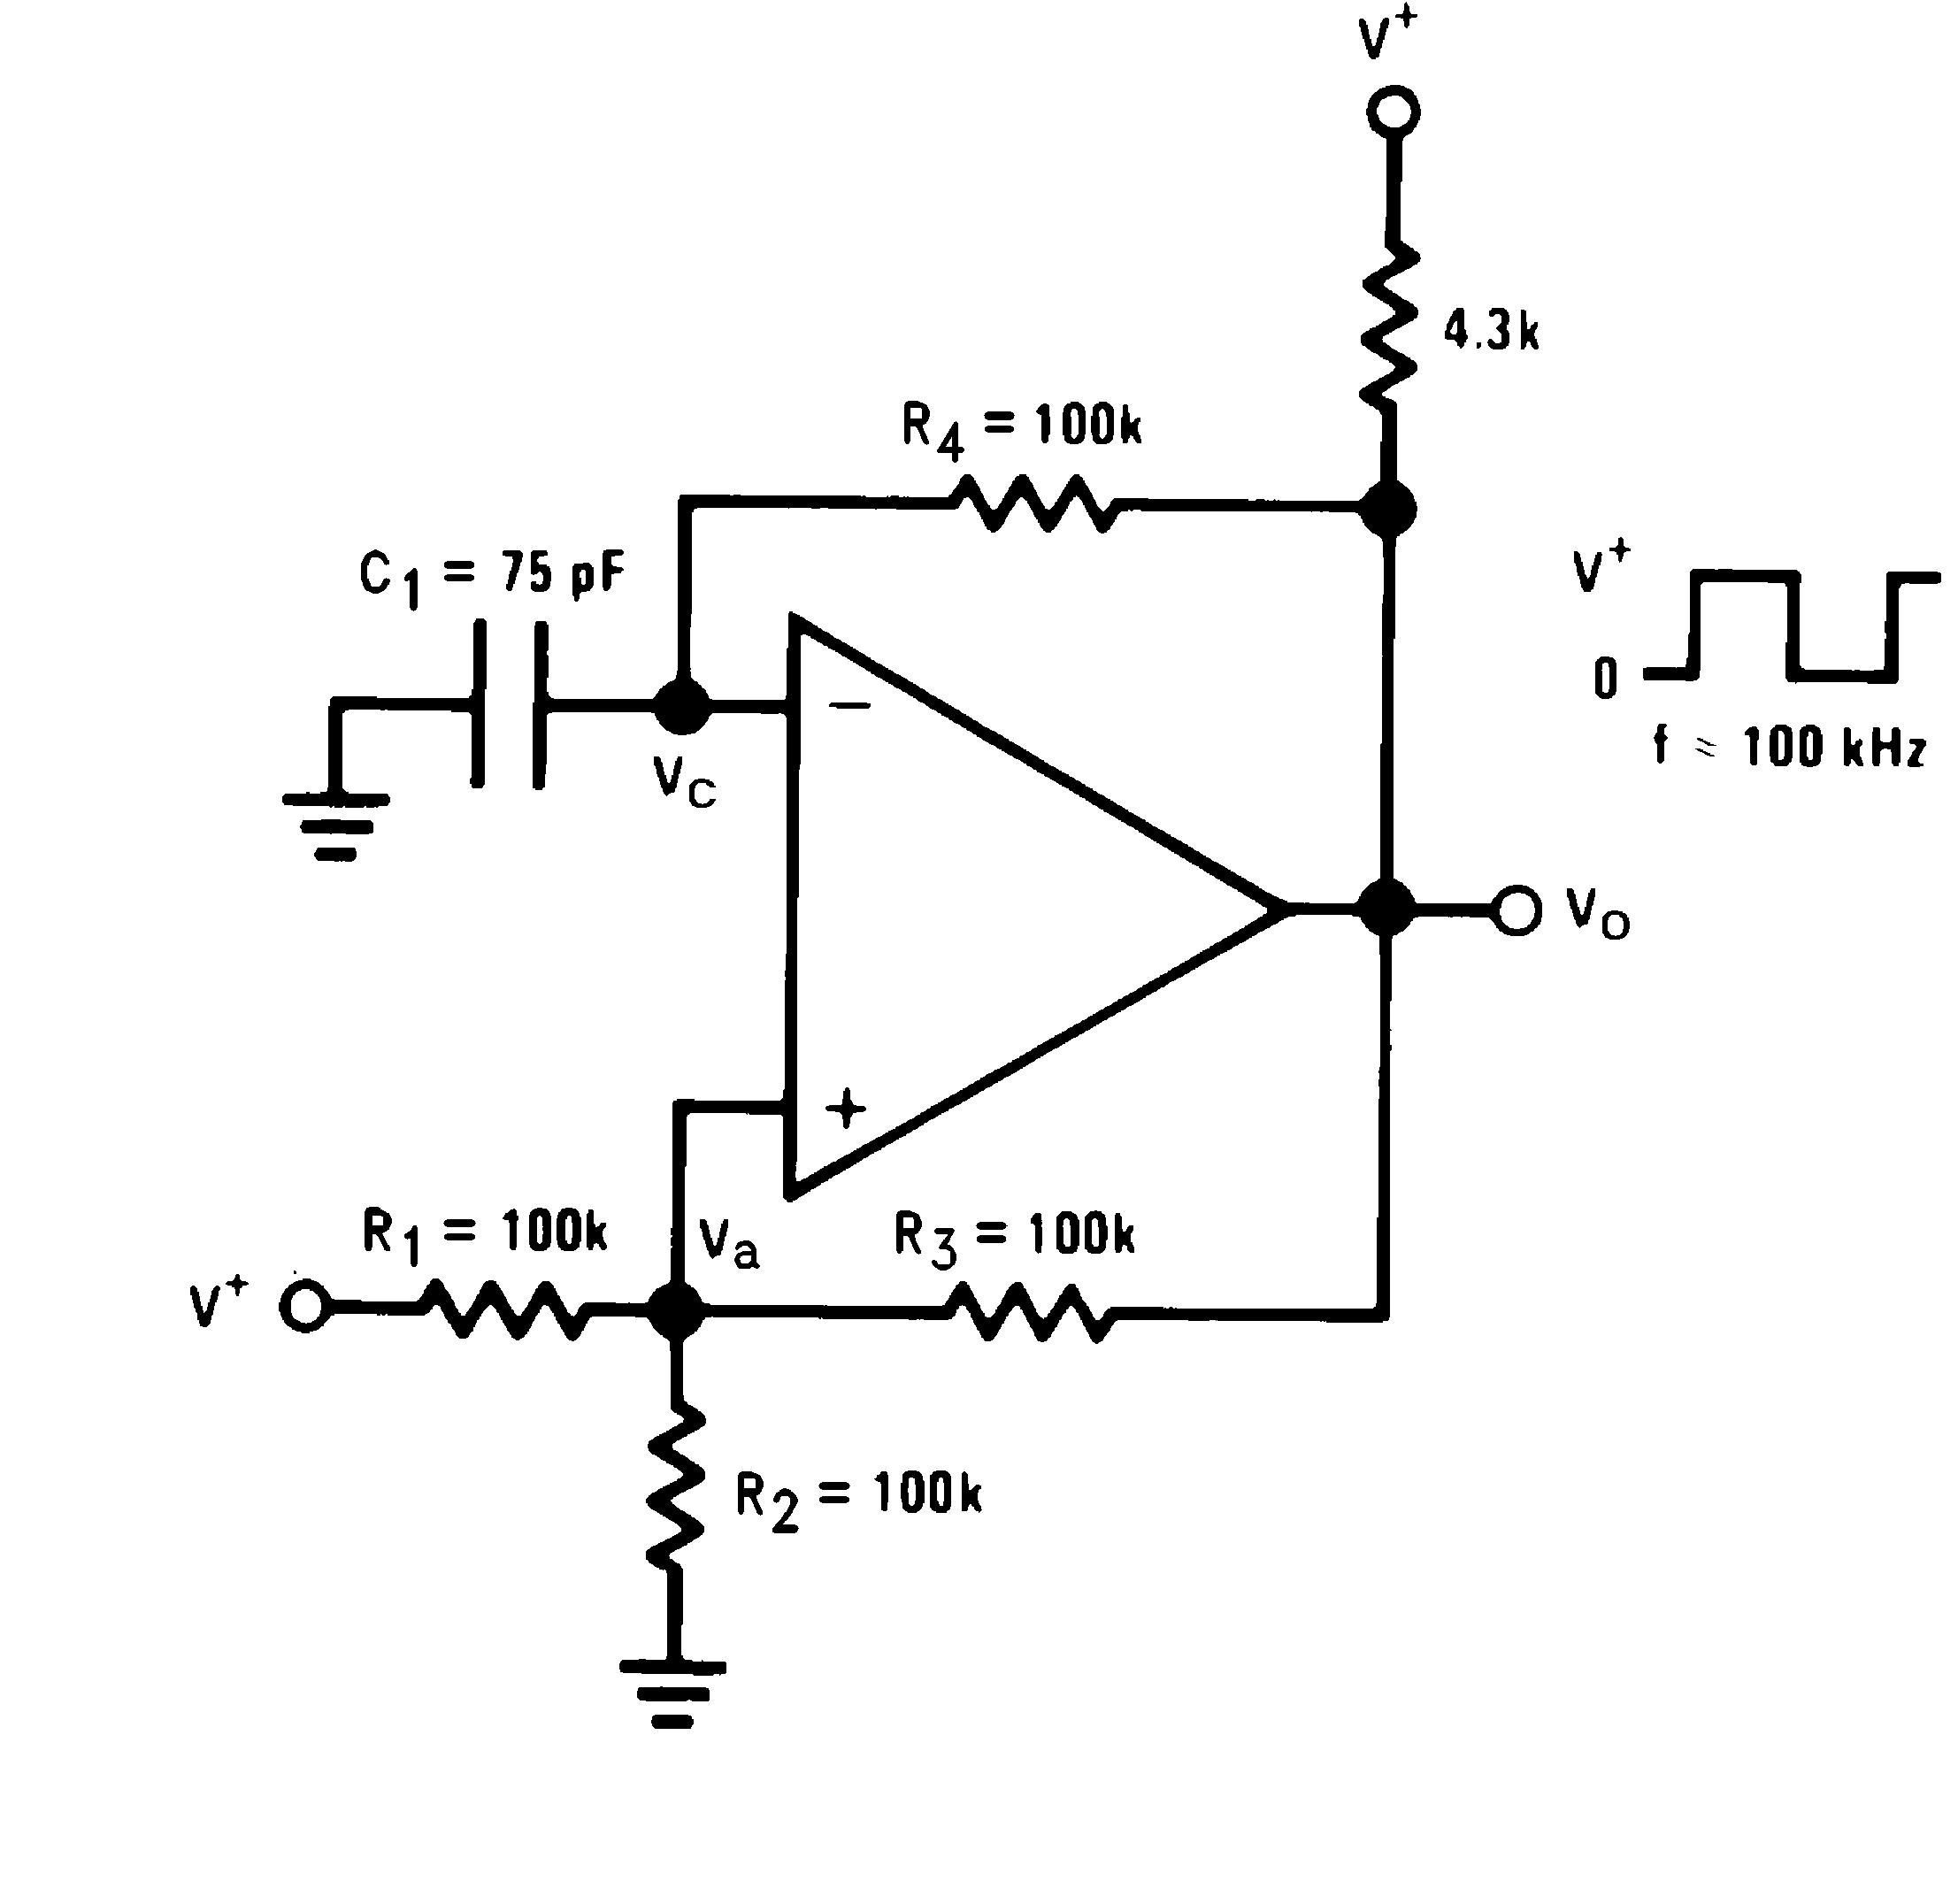 Lmv393 N Circuit Is Similar To The Transistor Version Of Hartley Oscillator 821 Squarewave